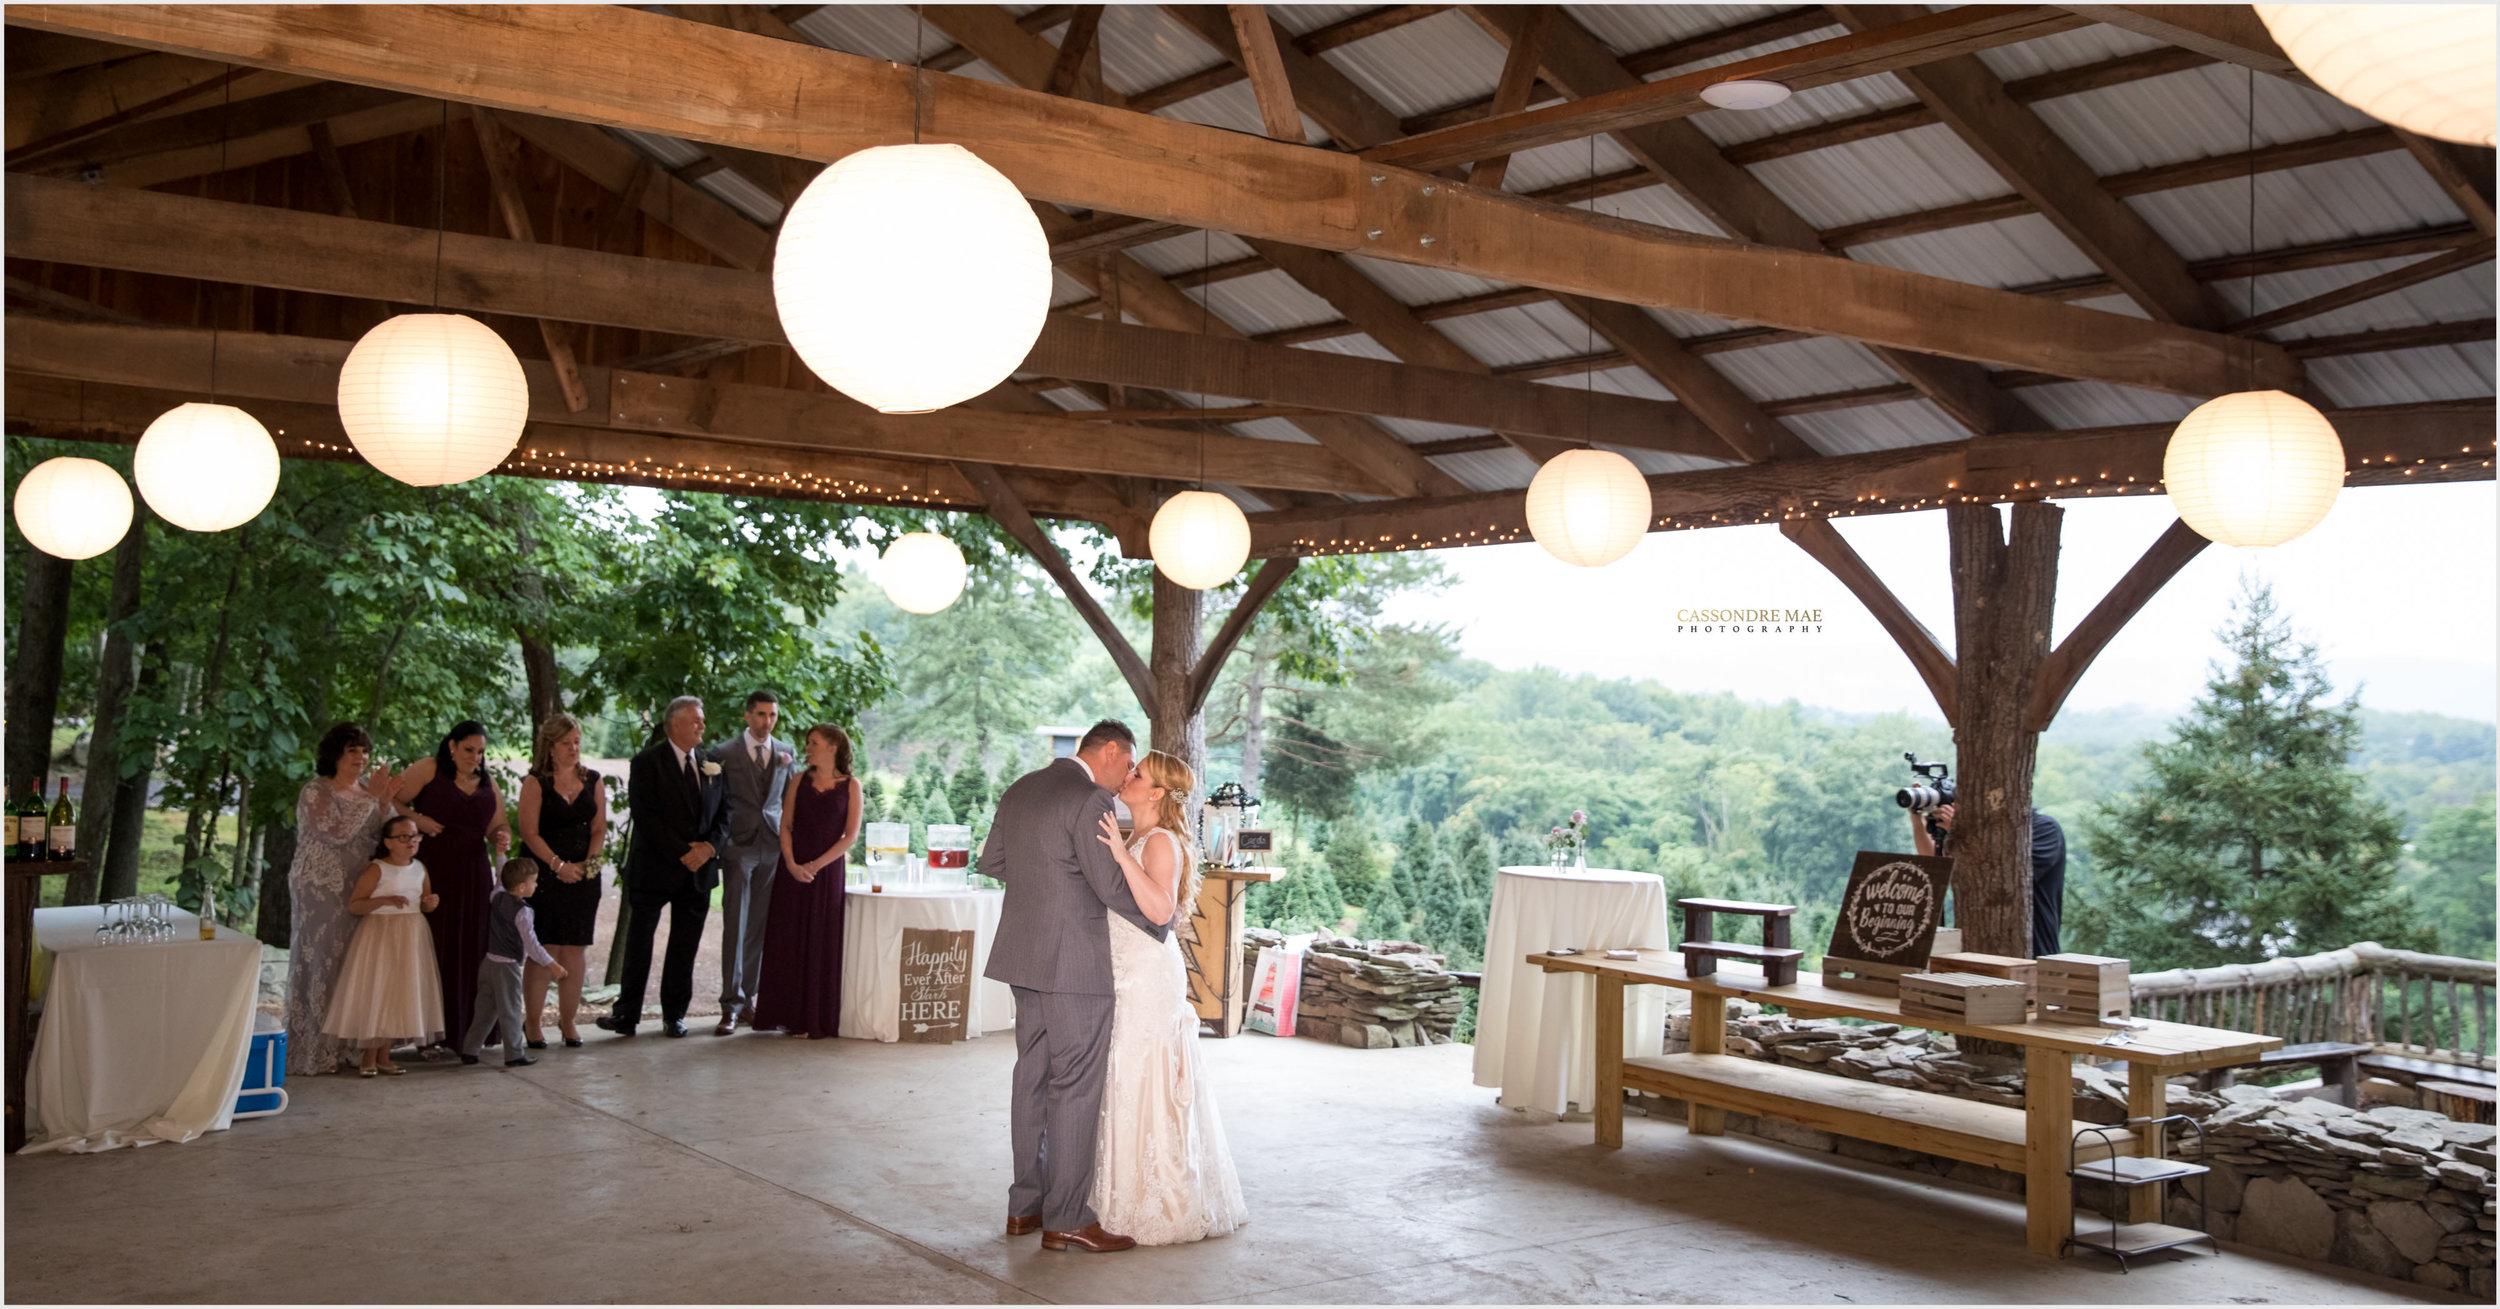 Cassondre Mae Photography Emmerich Tree Farm Wedding 4.jpg